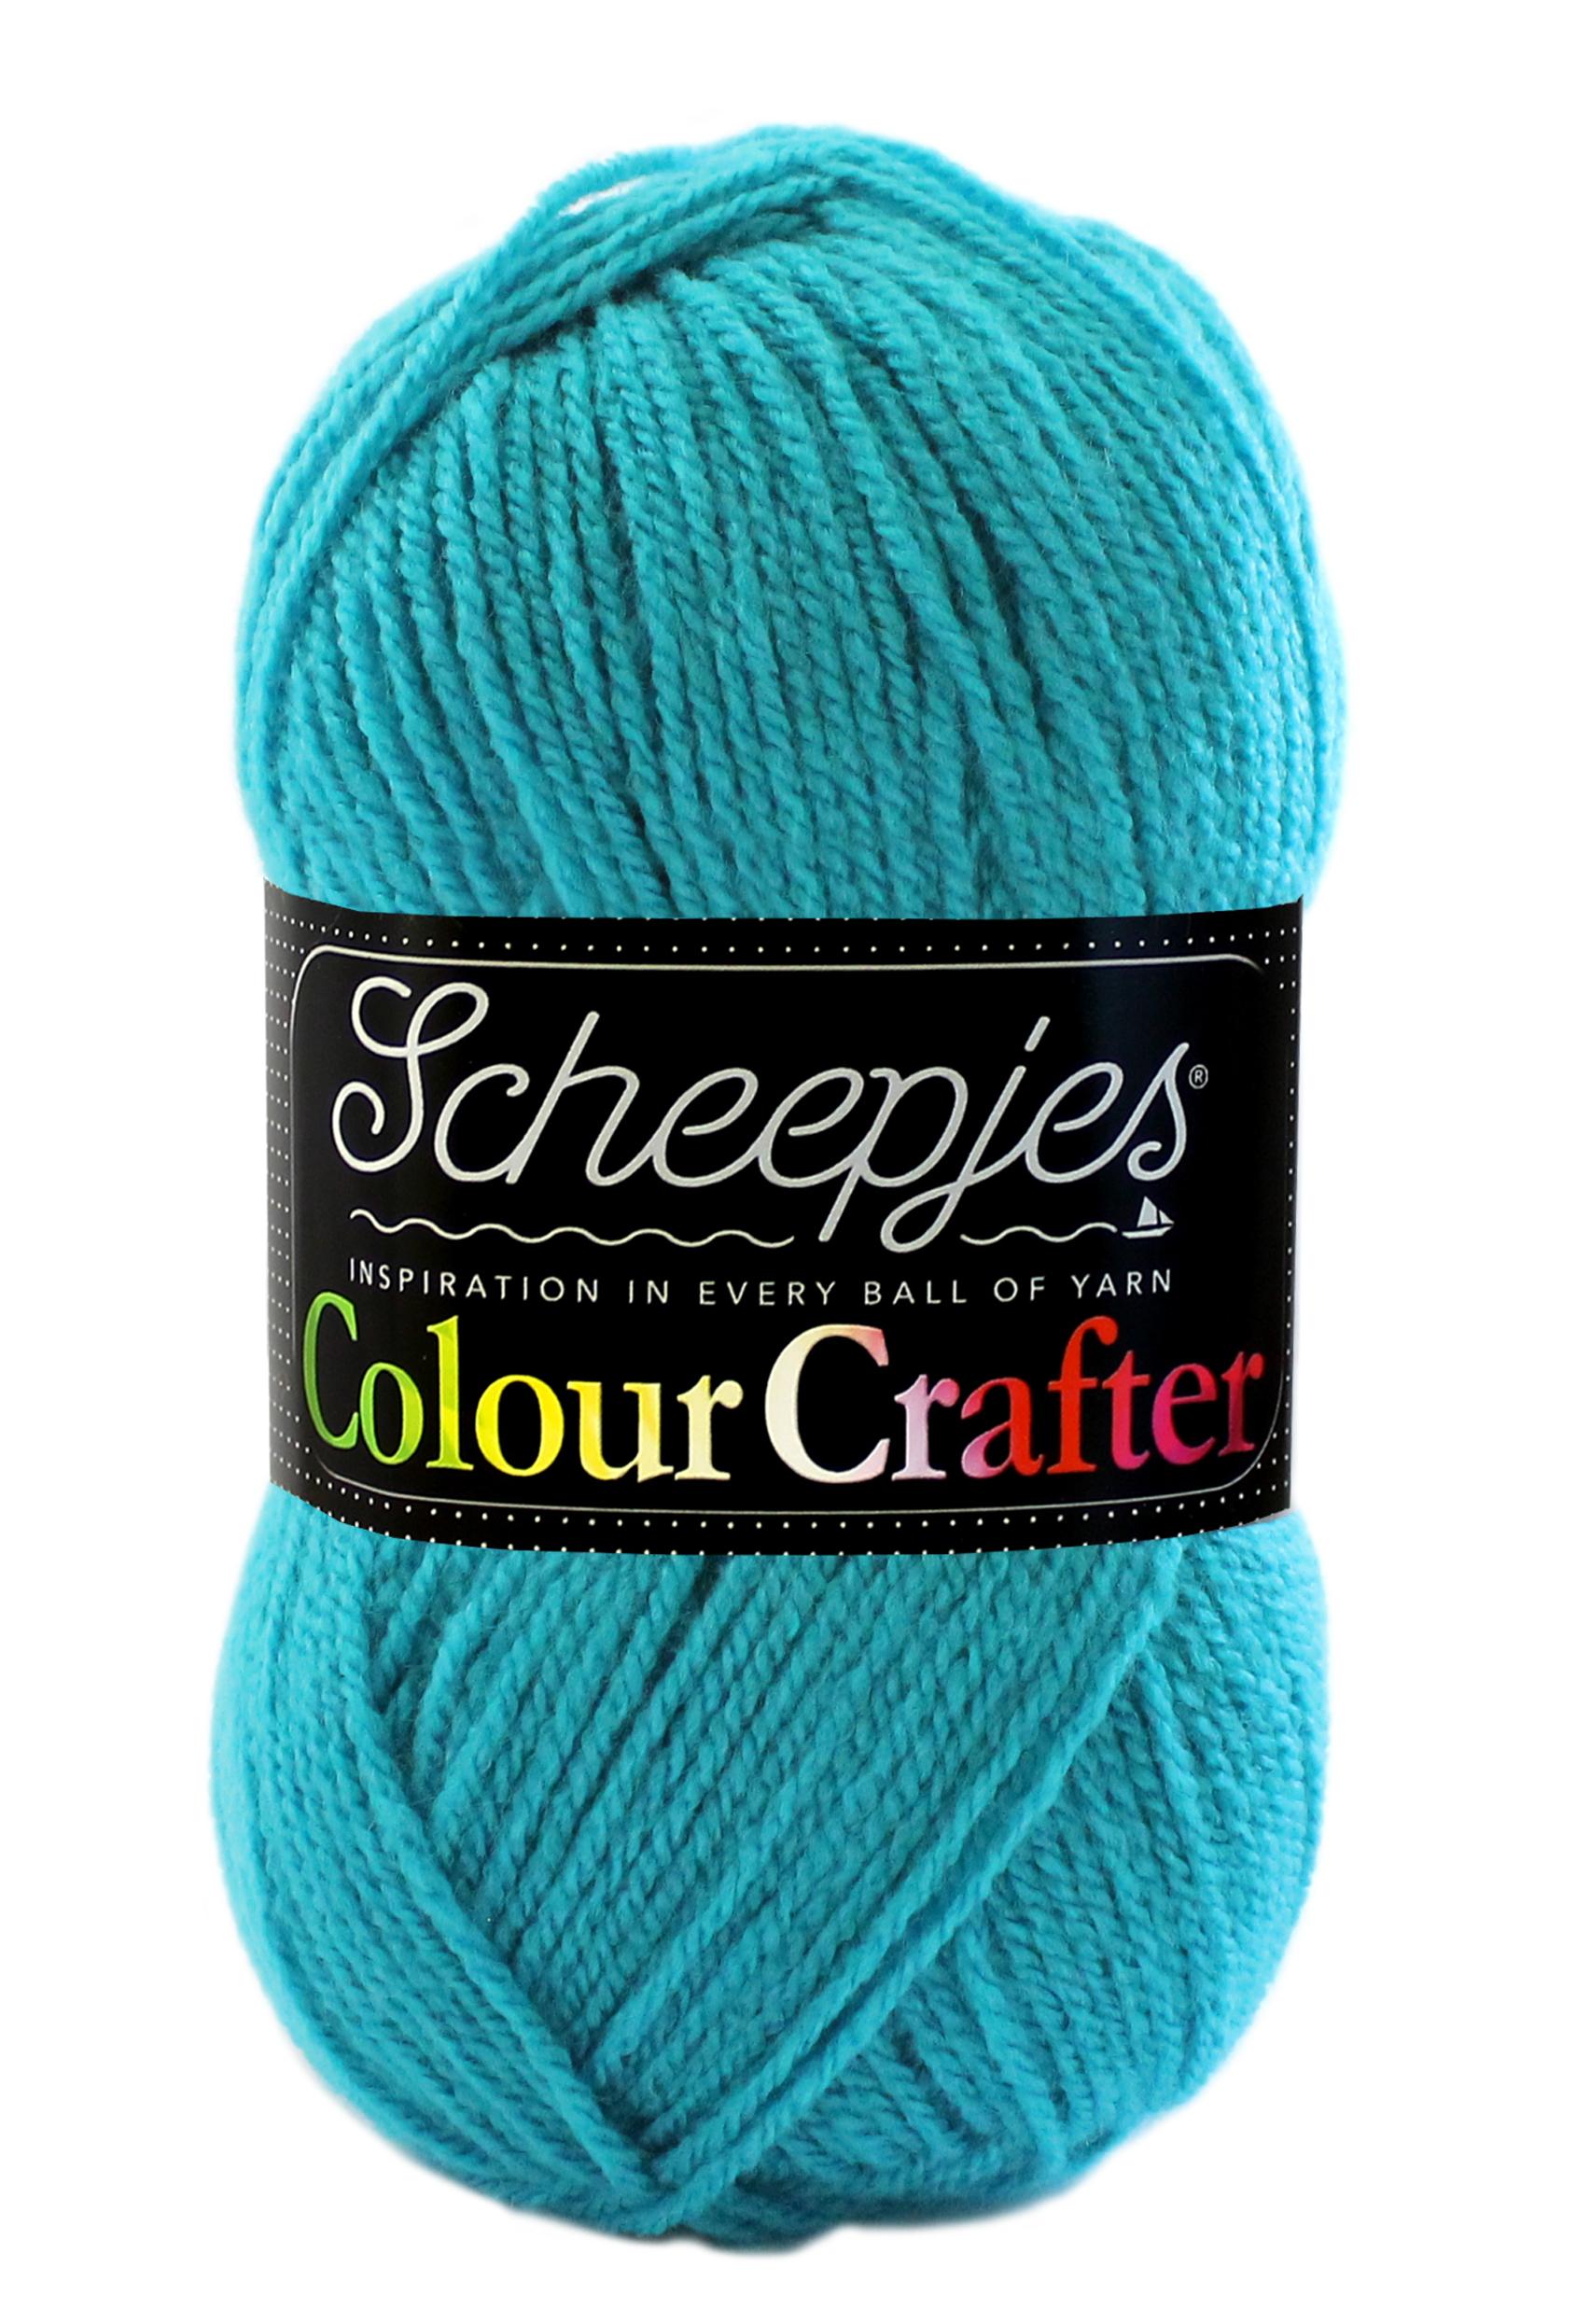 Scheepjes Colour Crafter – Bastonge 2015 | garrenhuisukeus.nl